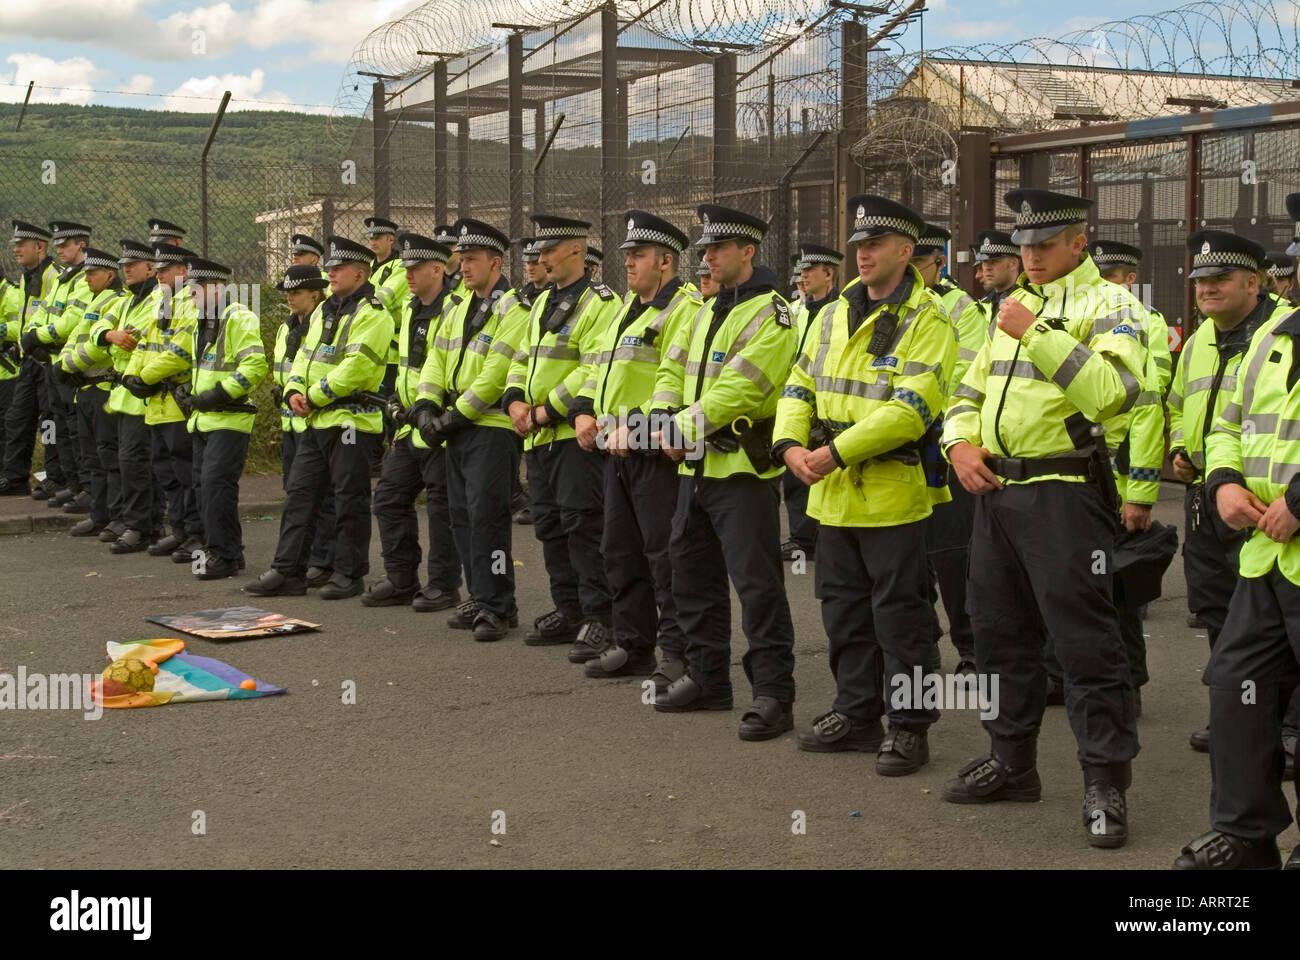 Police line at anti G8 protest, Faslane nuclear submarine base, Scotland, 2005. - Stock Image